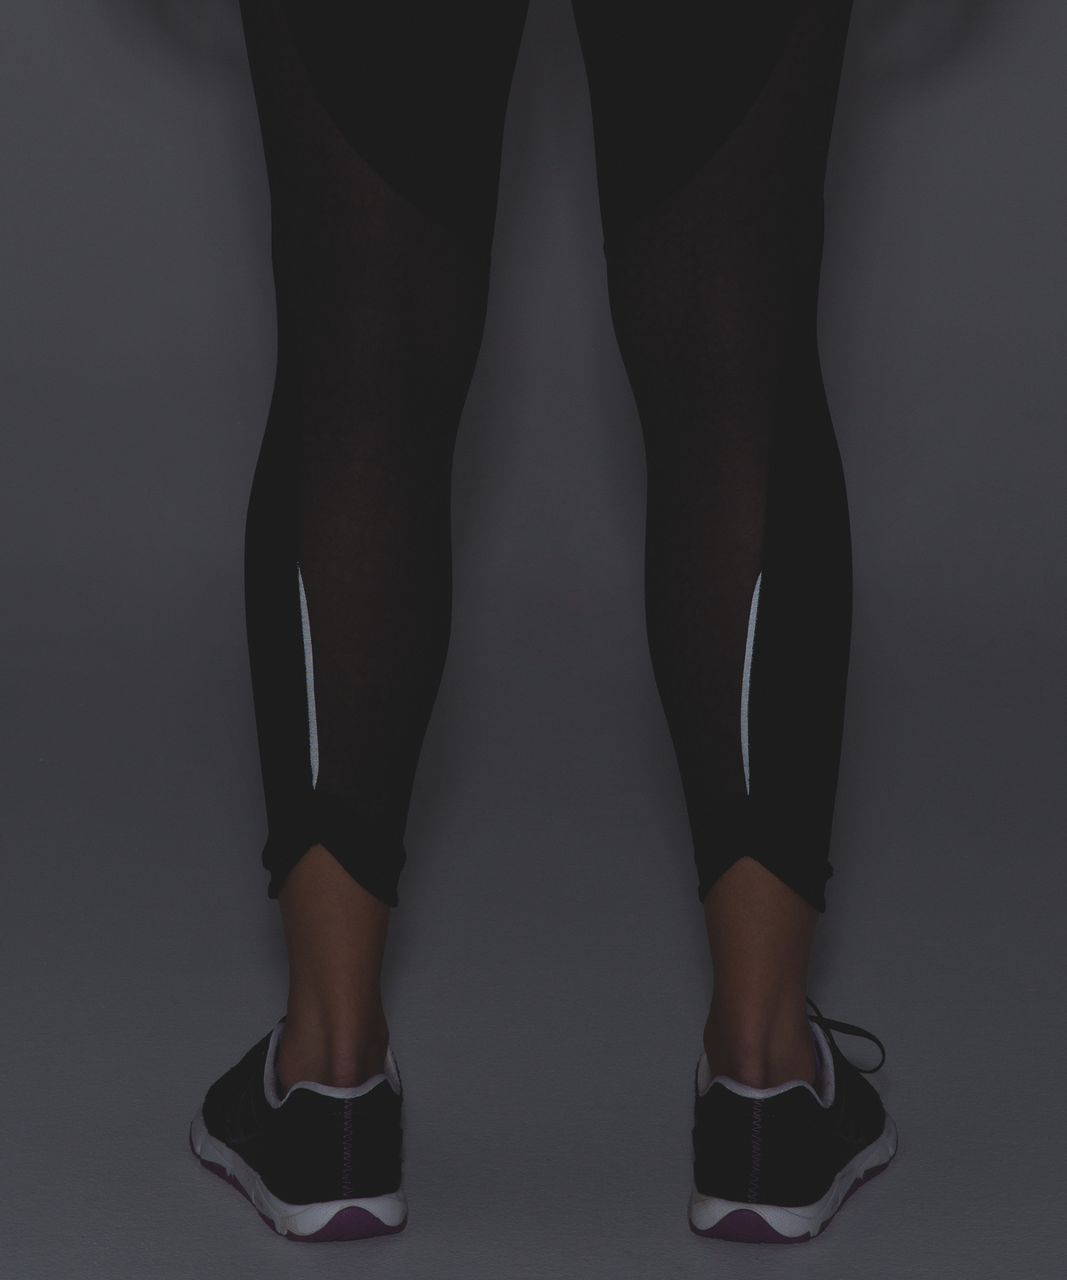 Lululemon Run With The Sun Tight - Black / Pretty Lace Deep Coal Black